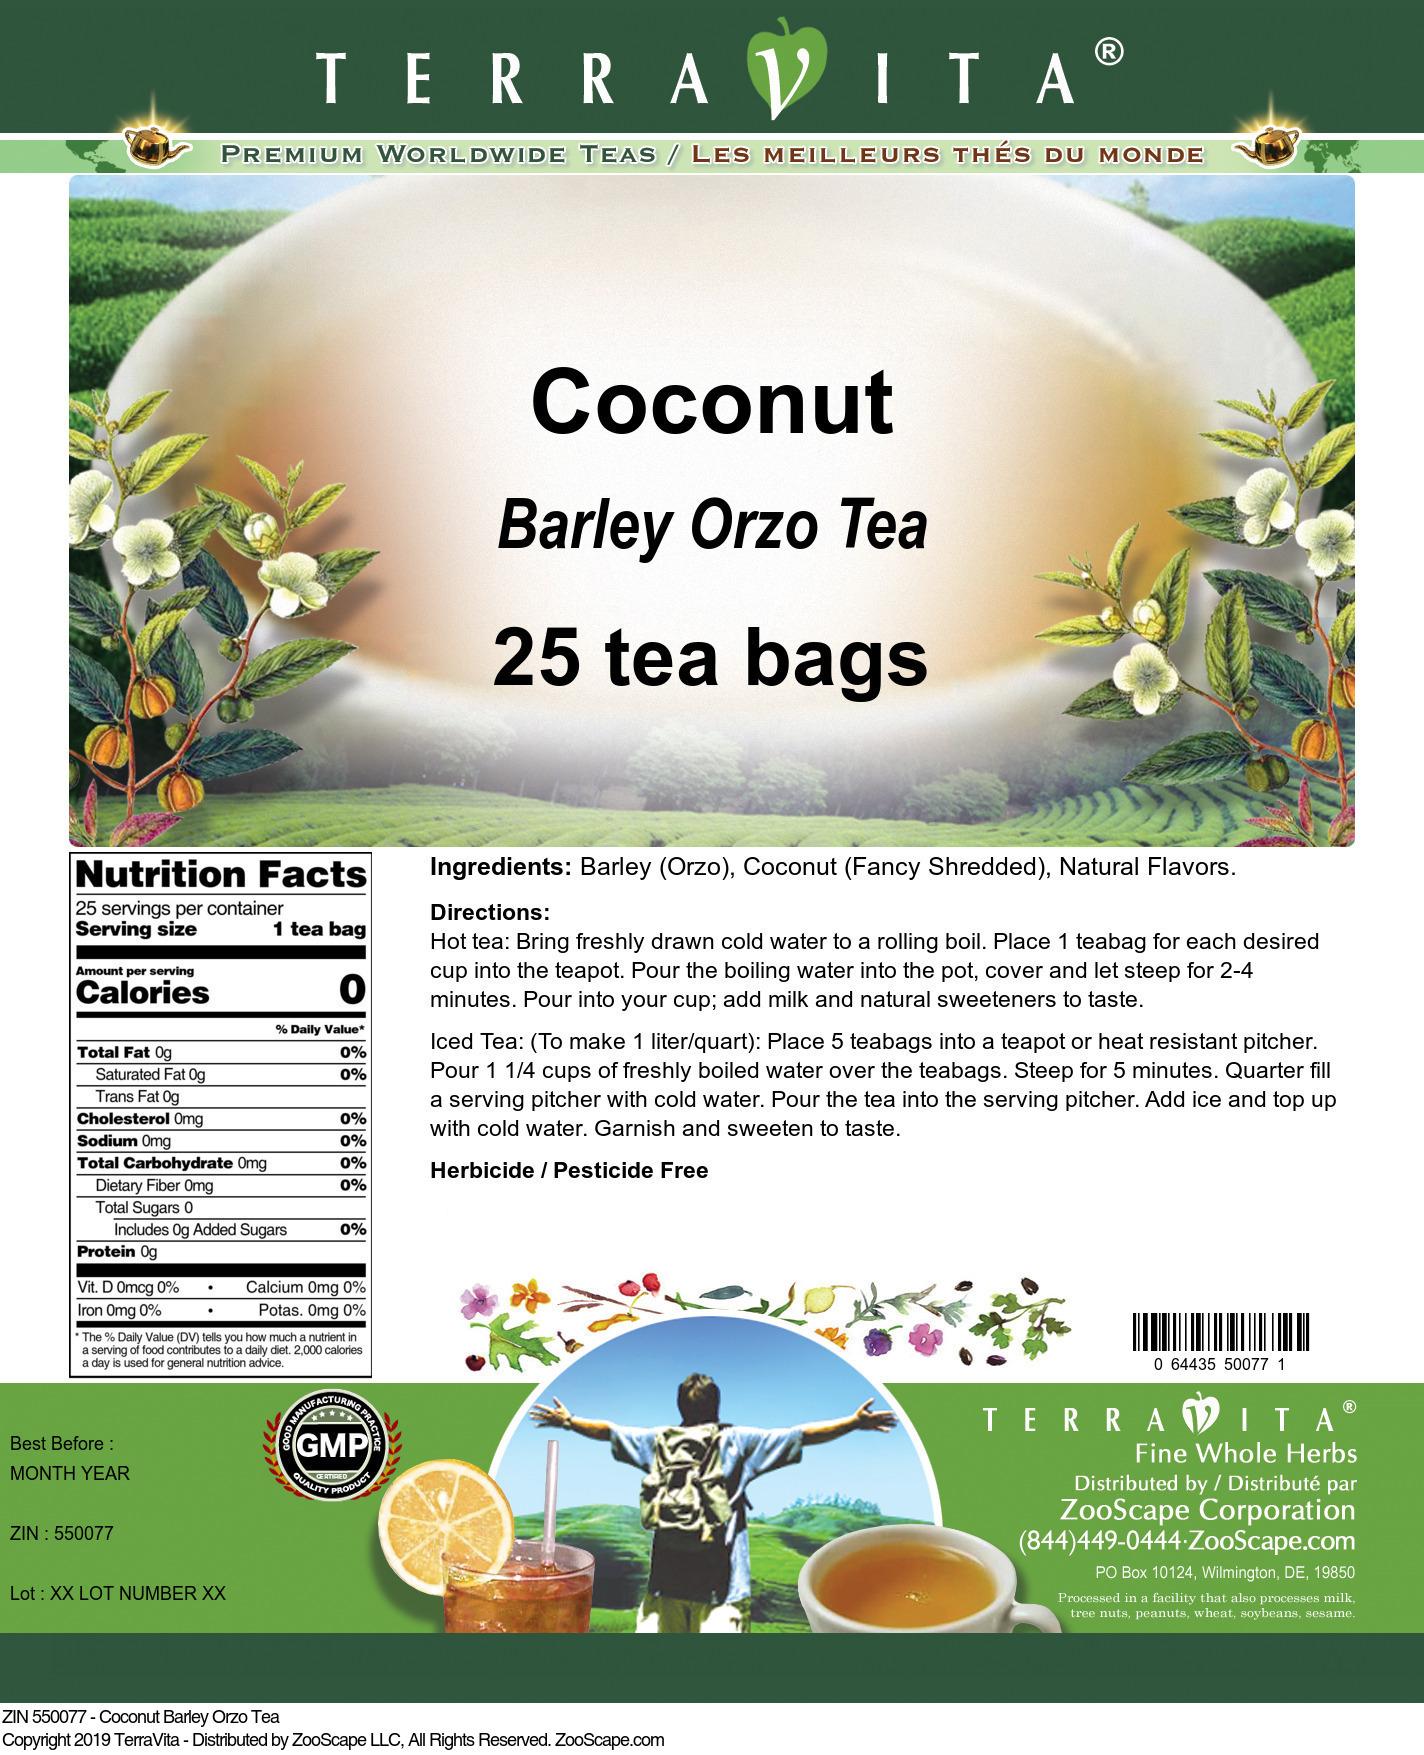 Coconut Barley Orzo